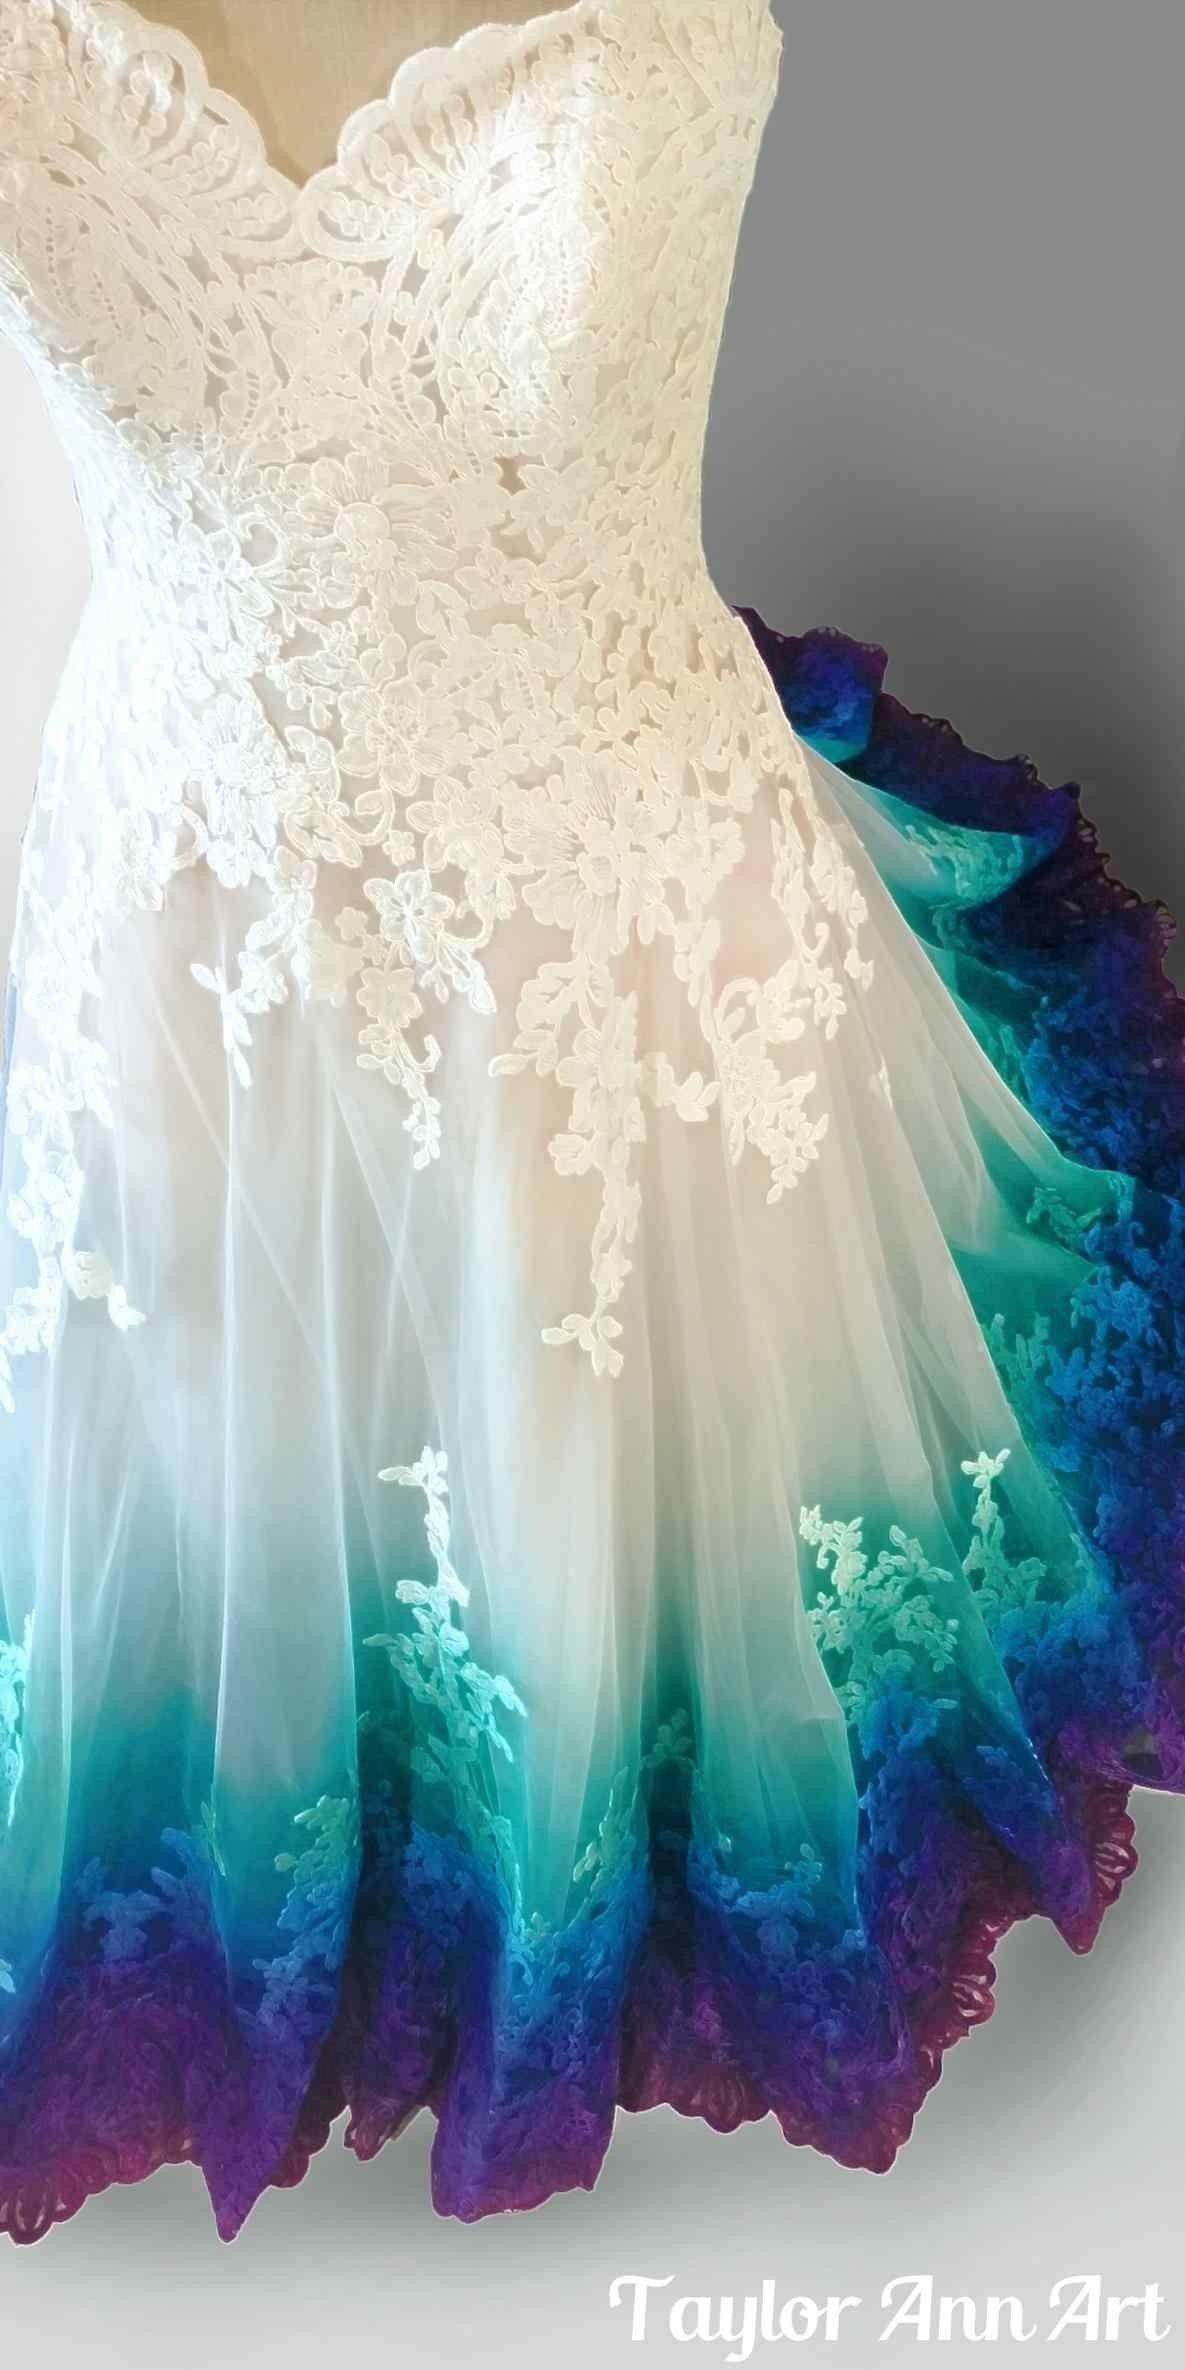 Tie Dye Wedding Dresses For Sale Fresh Peacock Wedding